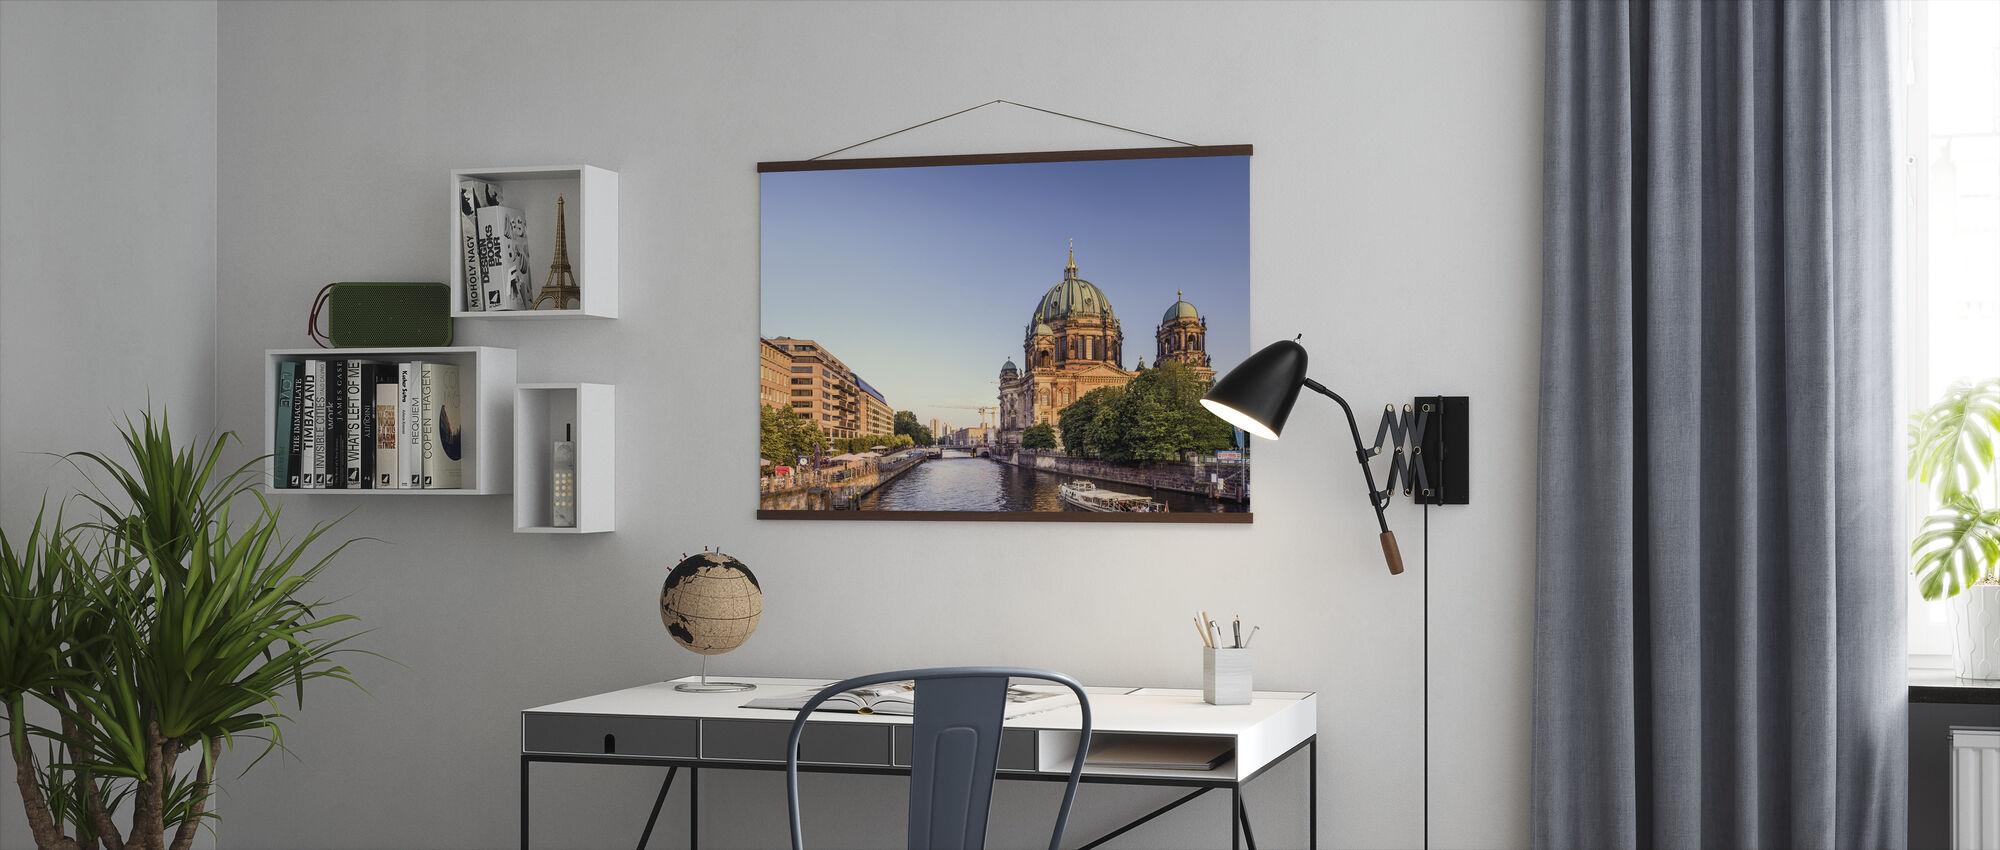 Berliner Dom - Poster - Office